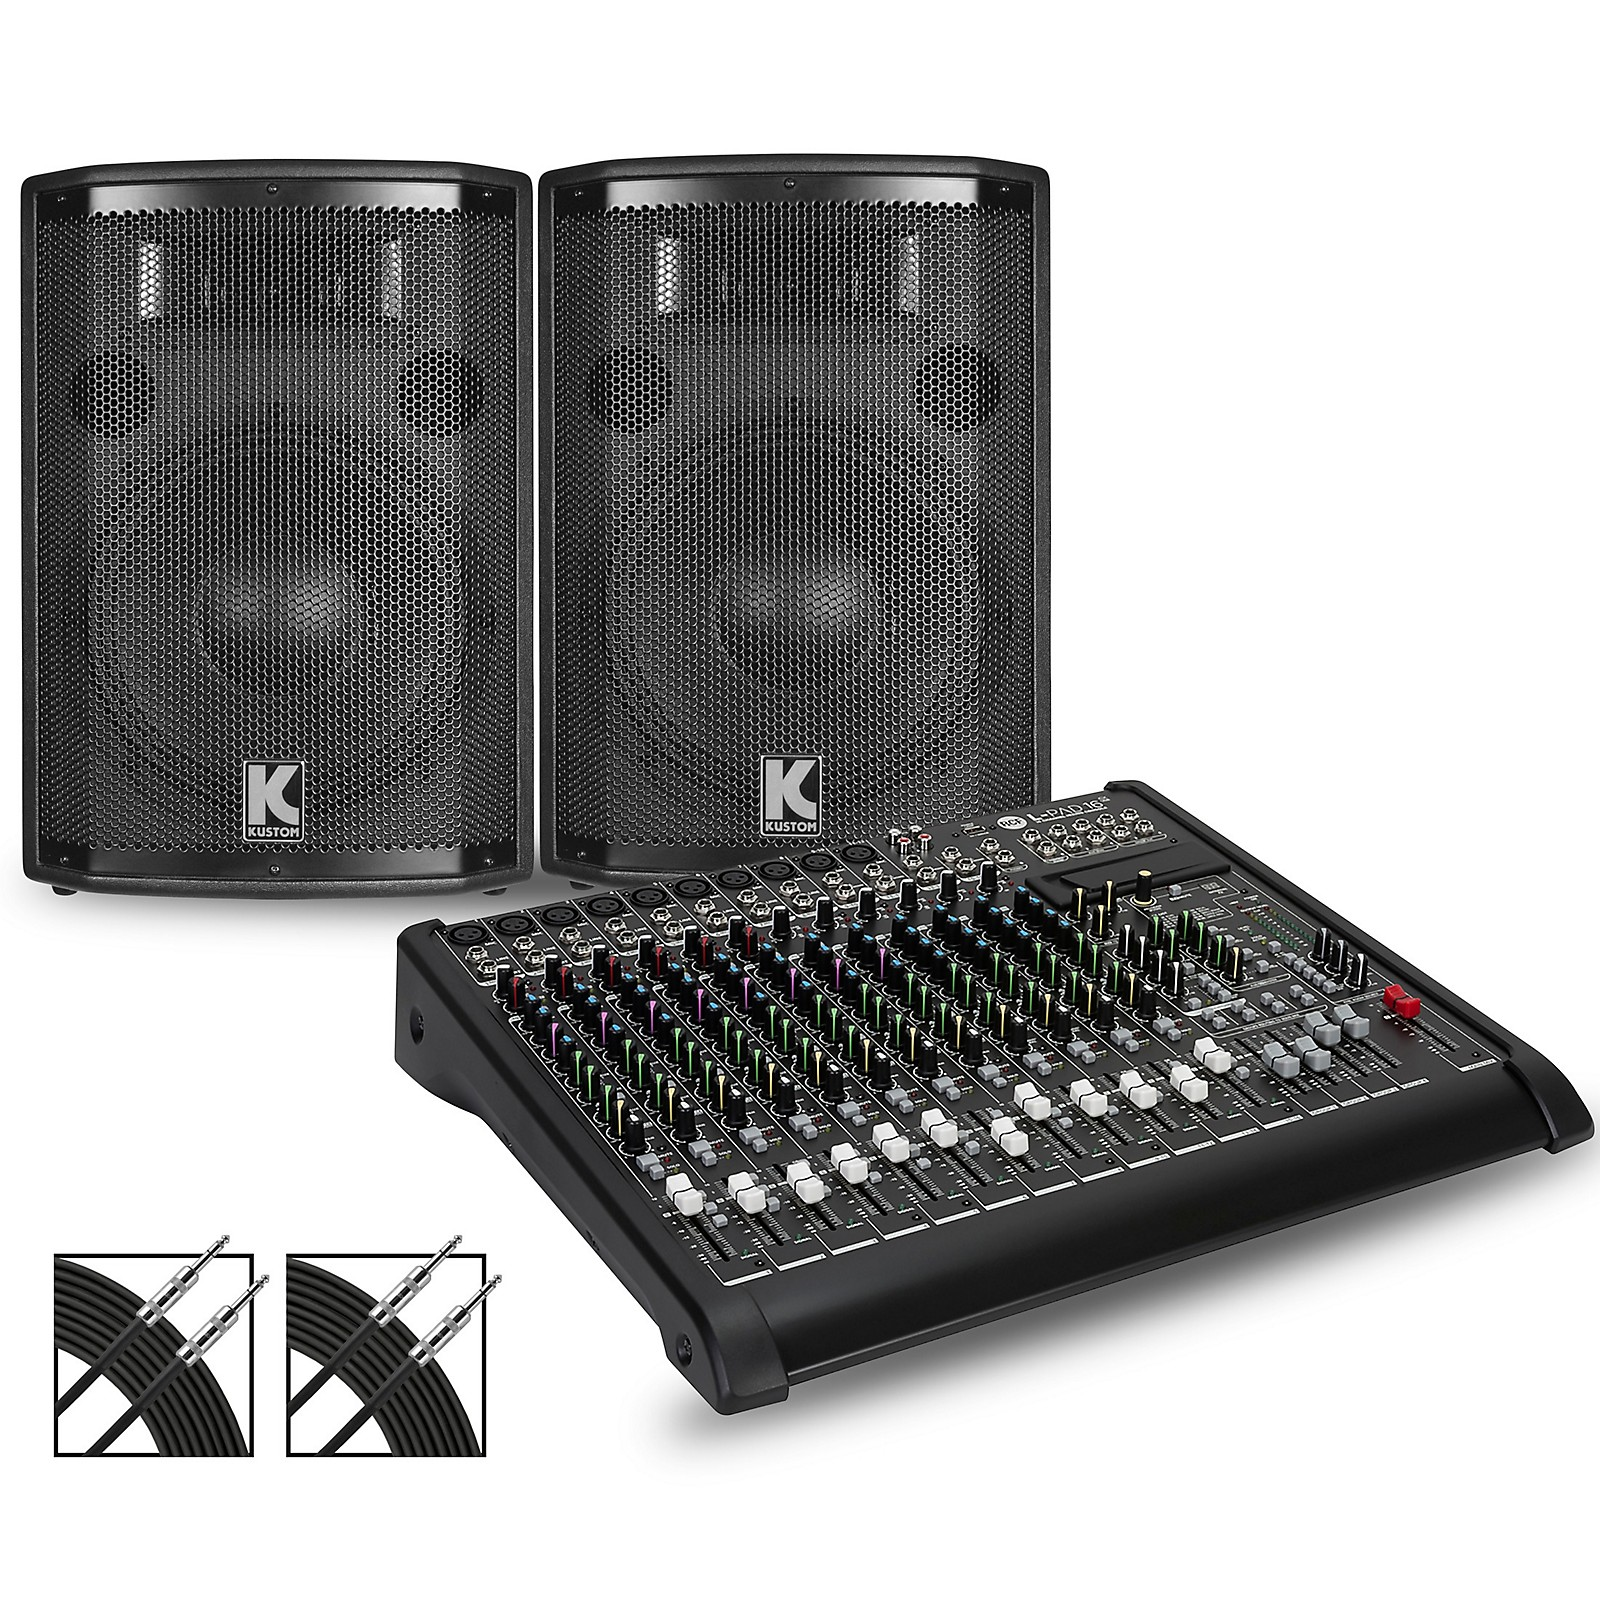 RCF LPAD-16X Mixer and Kustom HiPAC Speakers